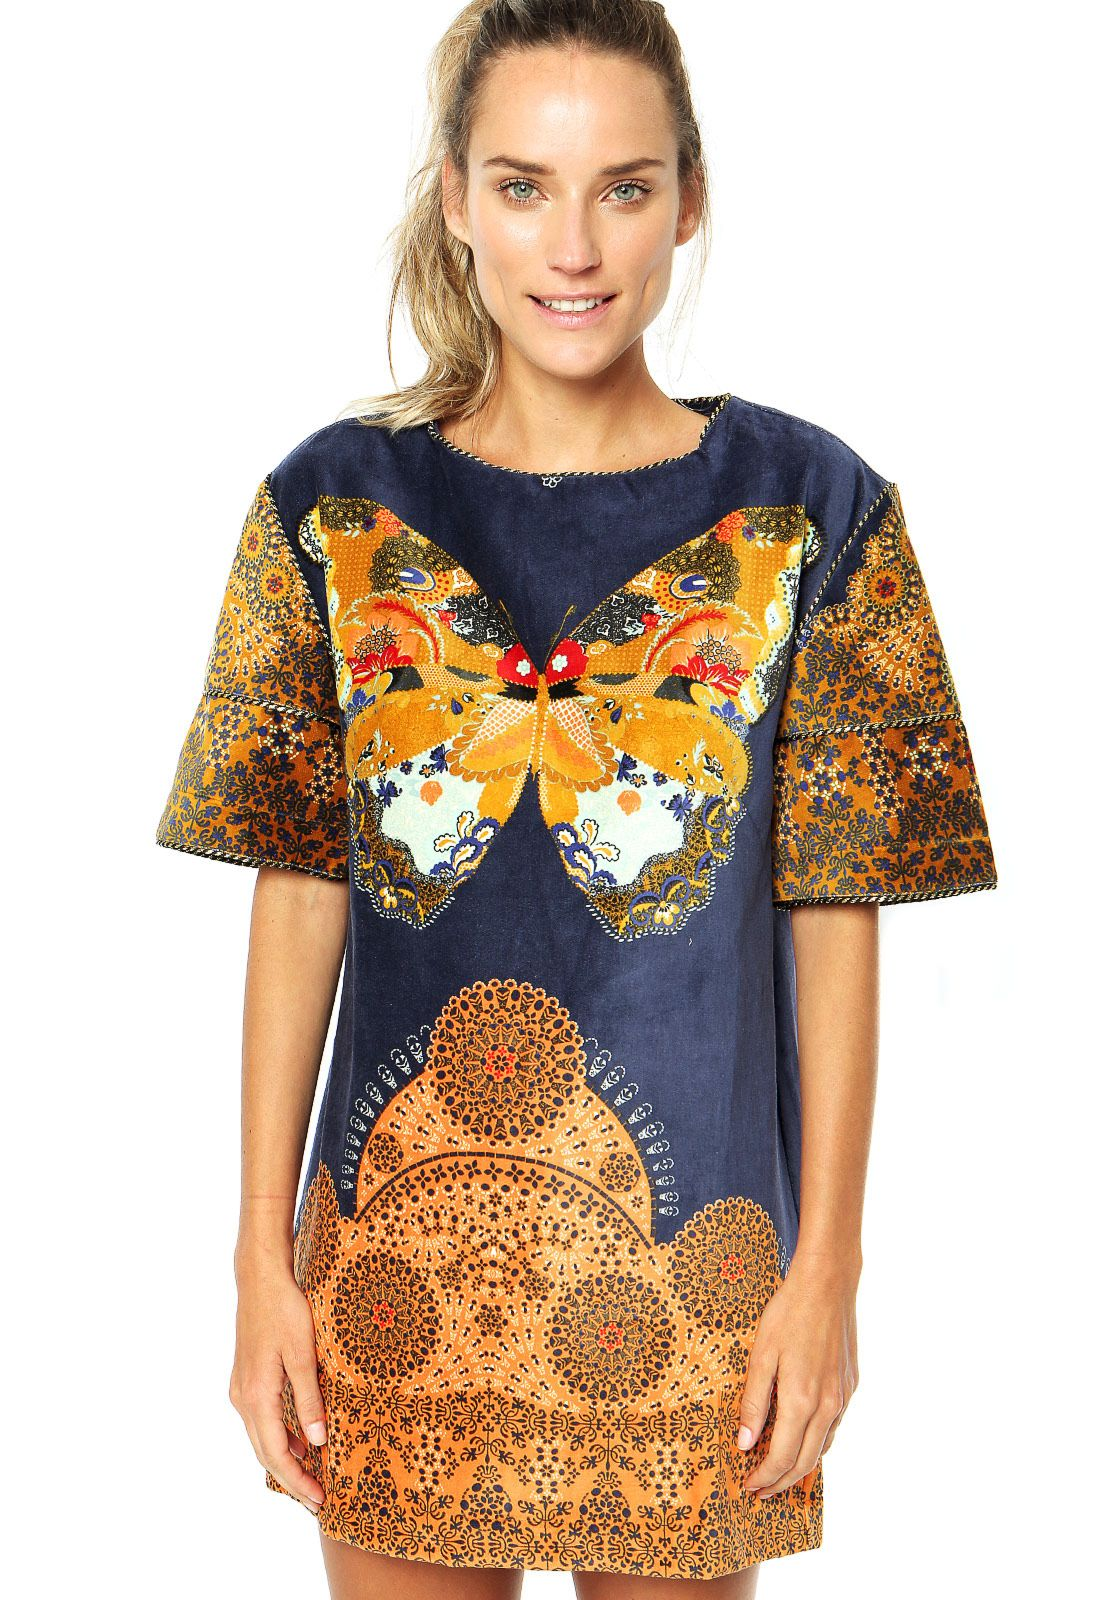 Vestido FARM Azul - Compre Agora | Dafiti Brasil